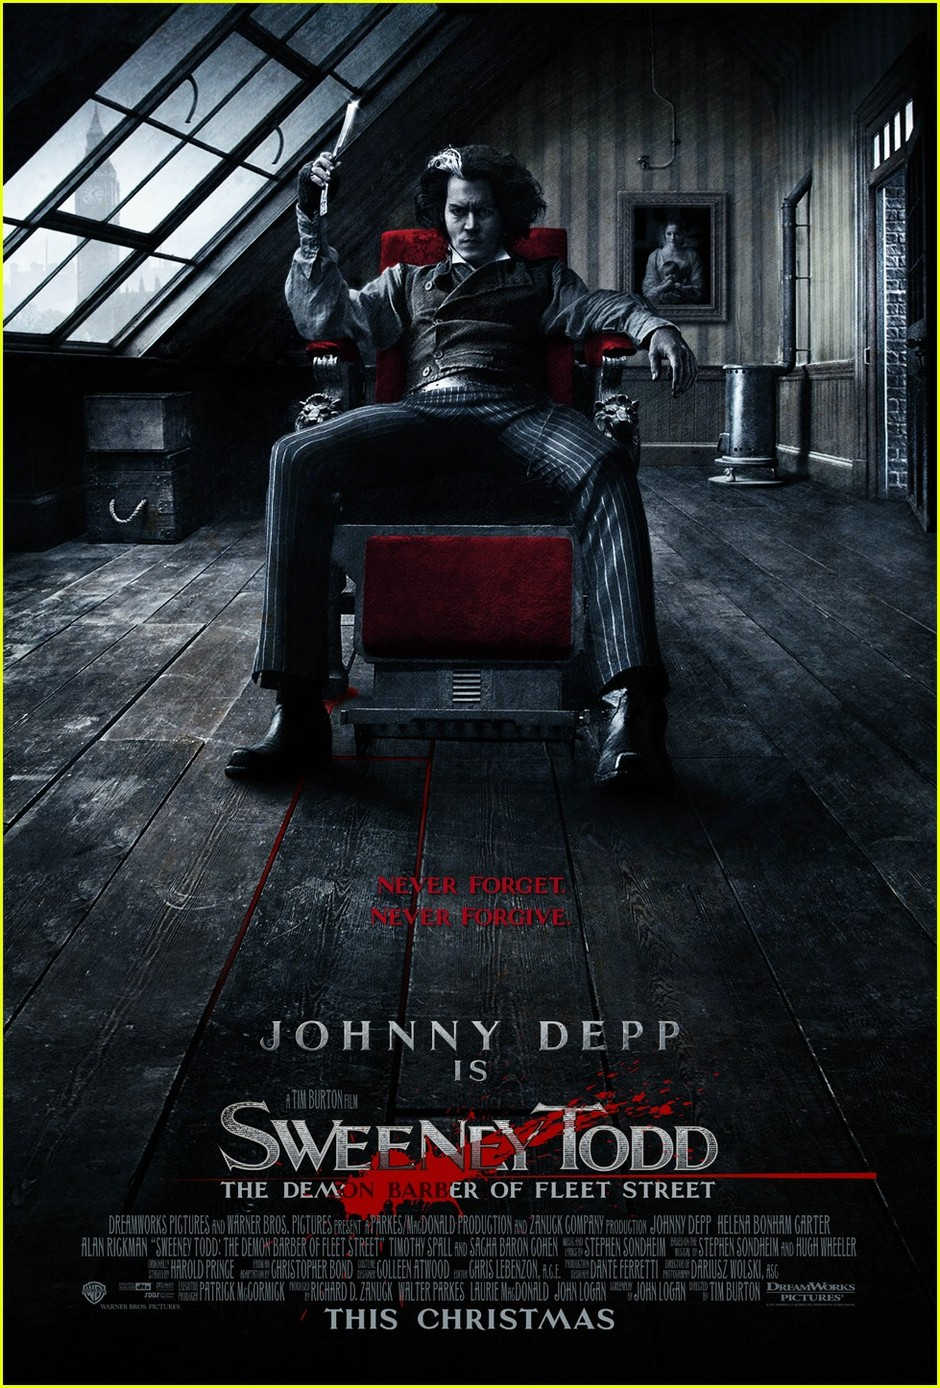 №7. «Суини Тодд, демон-парикмахер с Флит-стрит» (Sweeney Todd: The Demon Barber Of Fleet Street), 2007